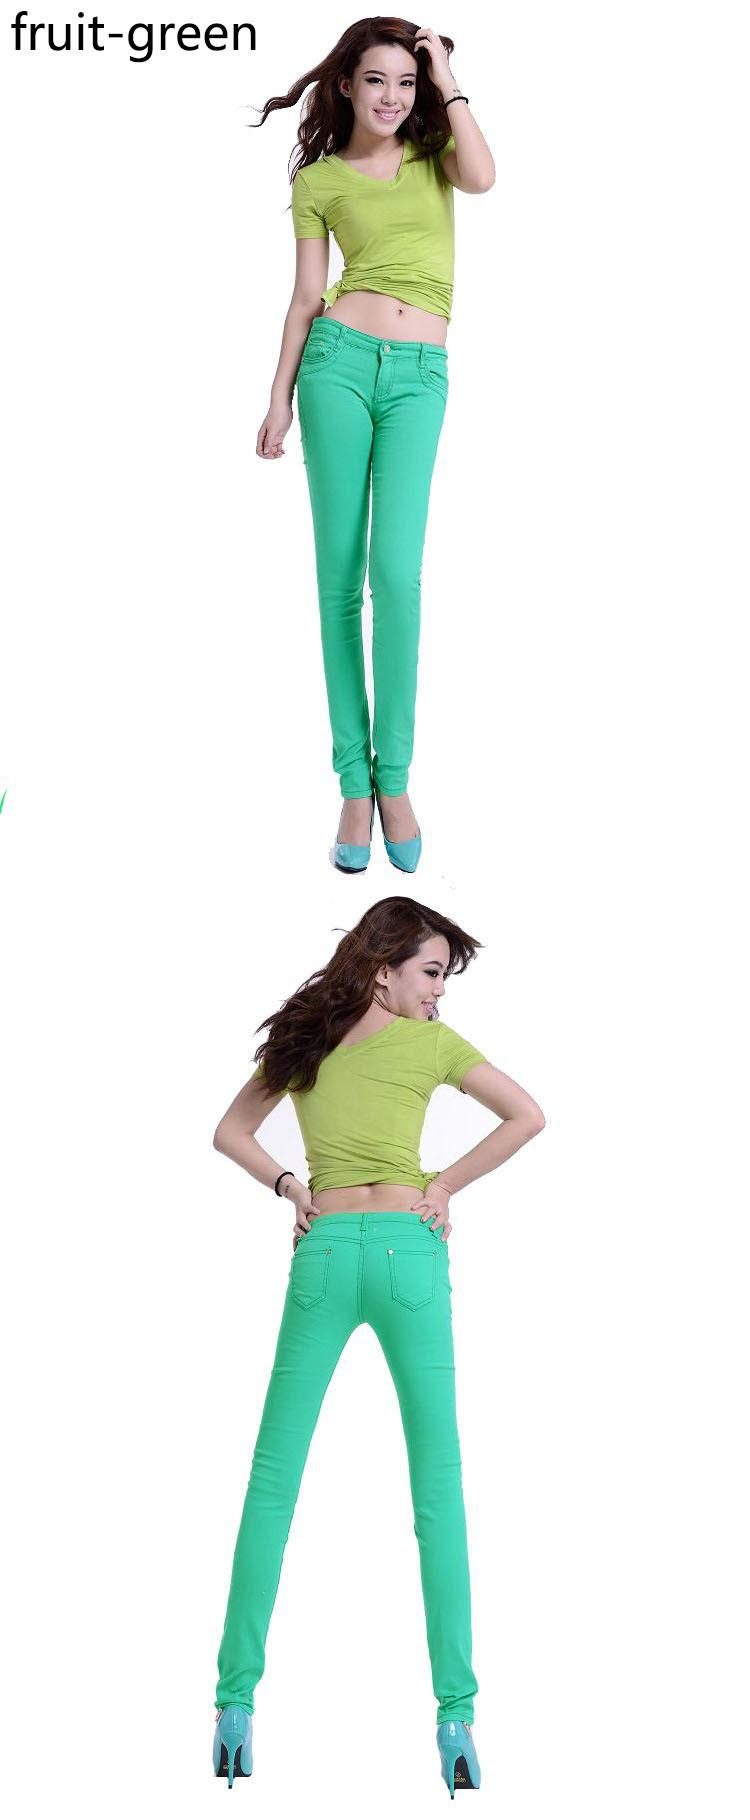 fruit-green